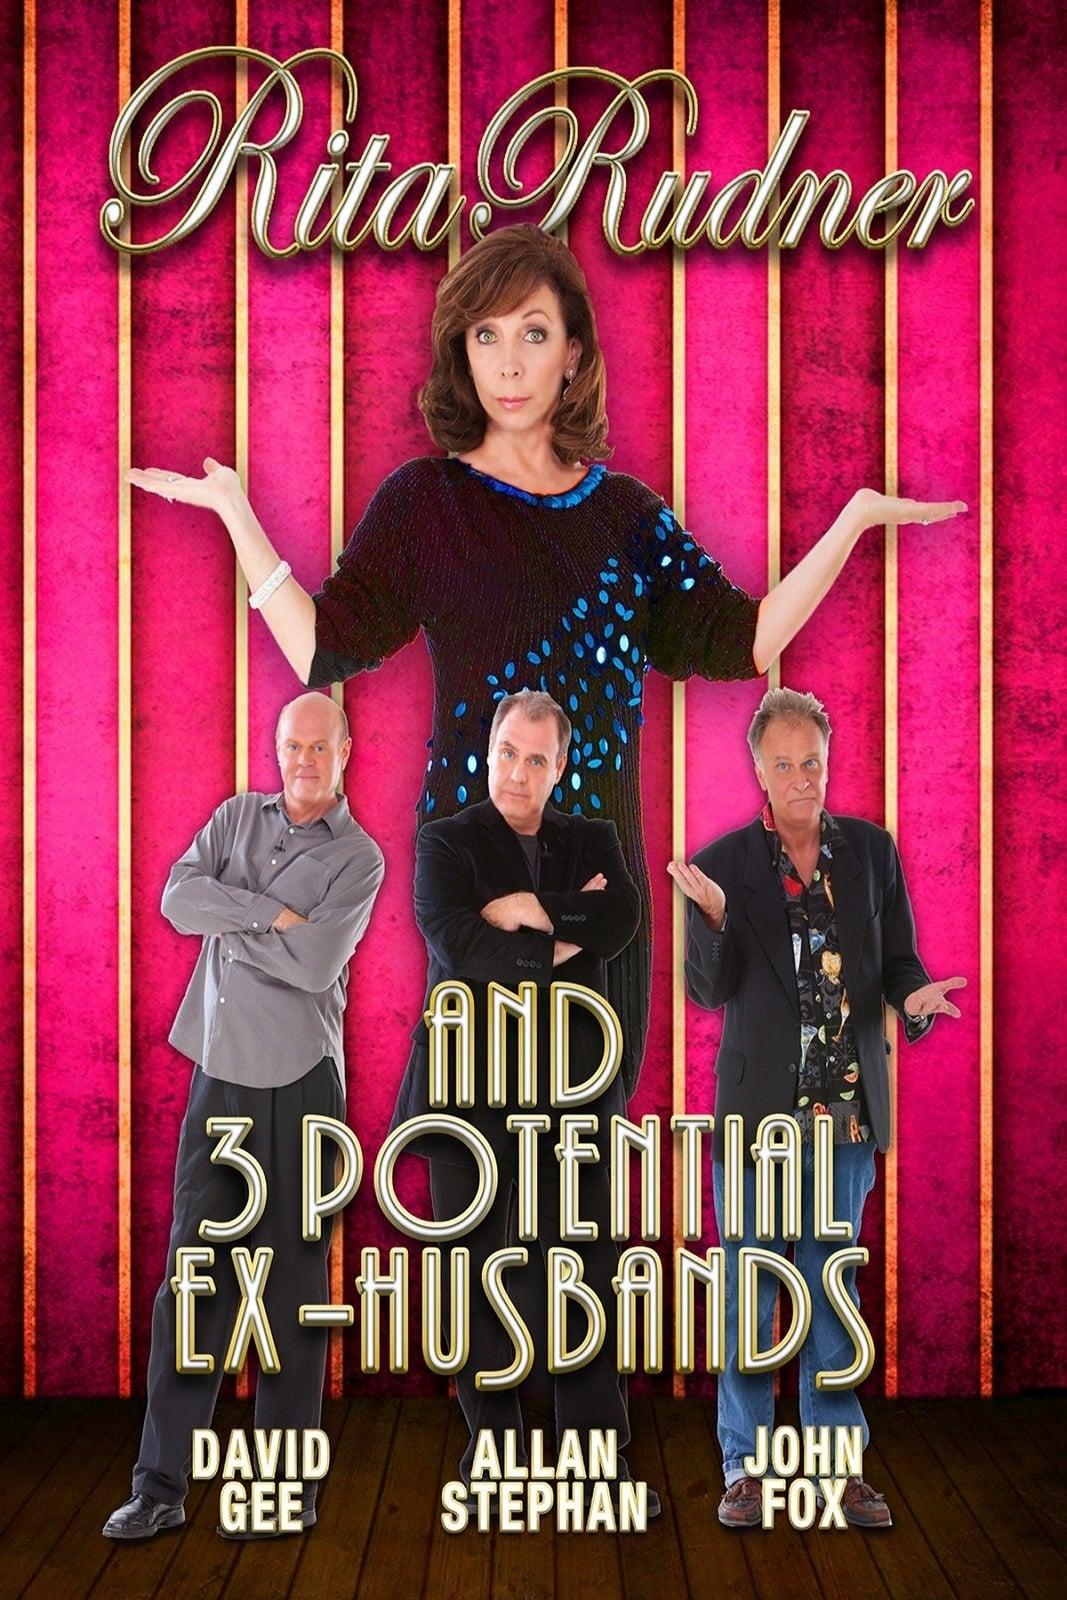 Rita Rudner and 3 Potential Ex-Husbands (2012)